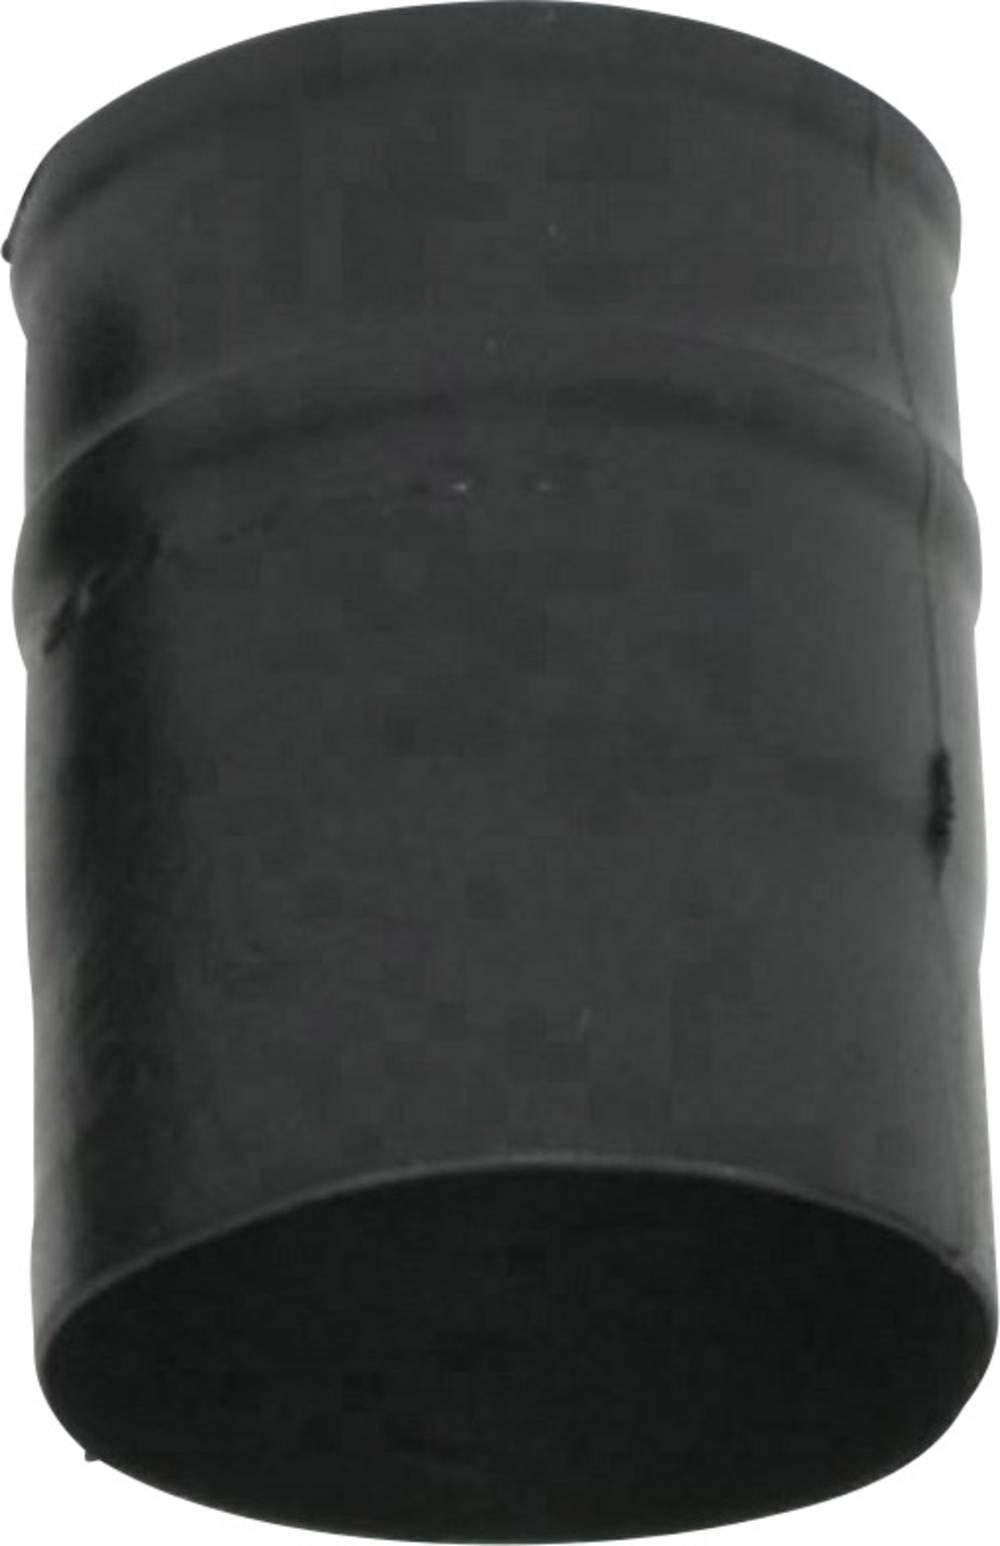 Skupljajuća čahura, ravna, prije/nakon skupljanja: 17 mm/6.9 mm 1 kom. crna